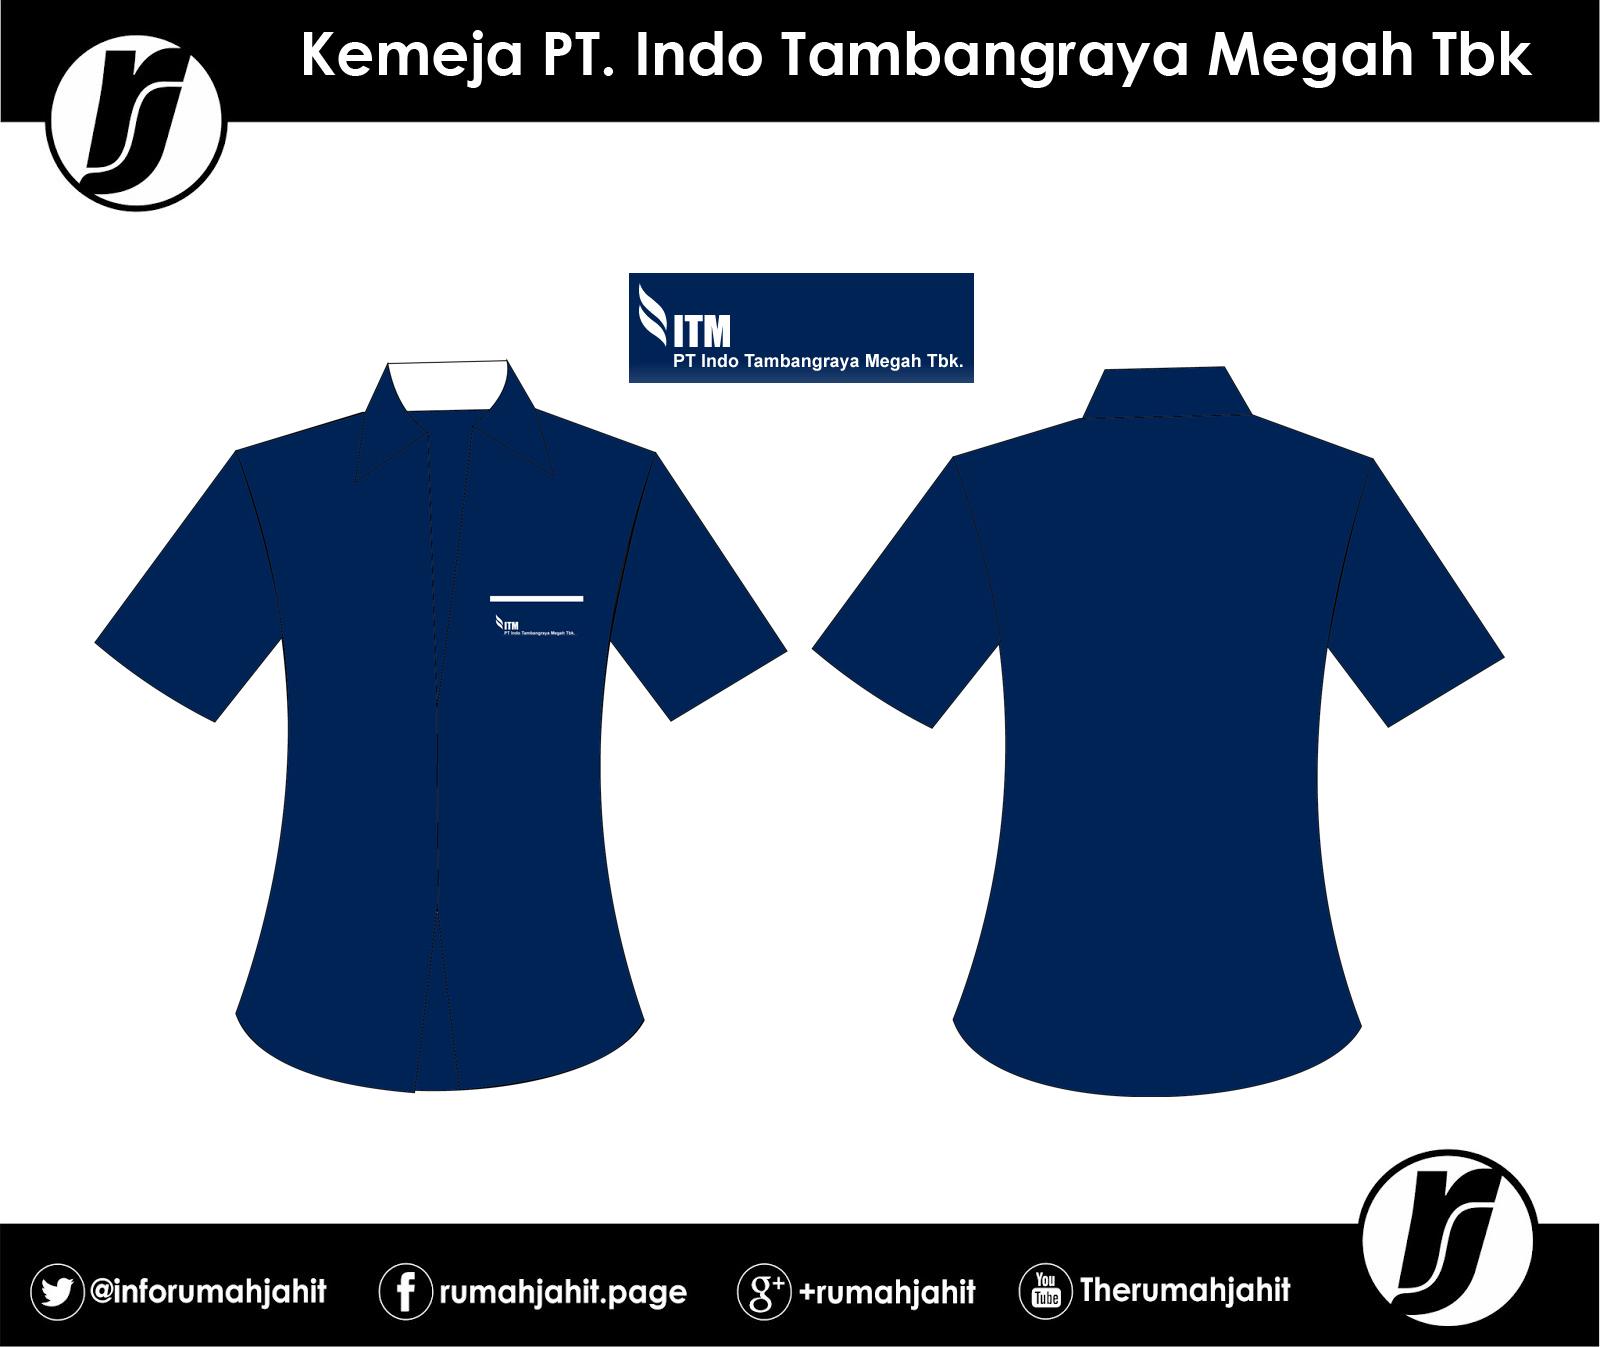 Kemeja PT Indo Tambangraya Megah Tbk